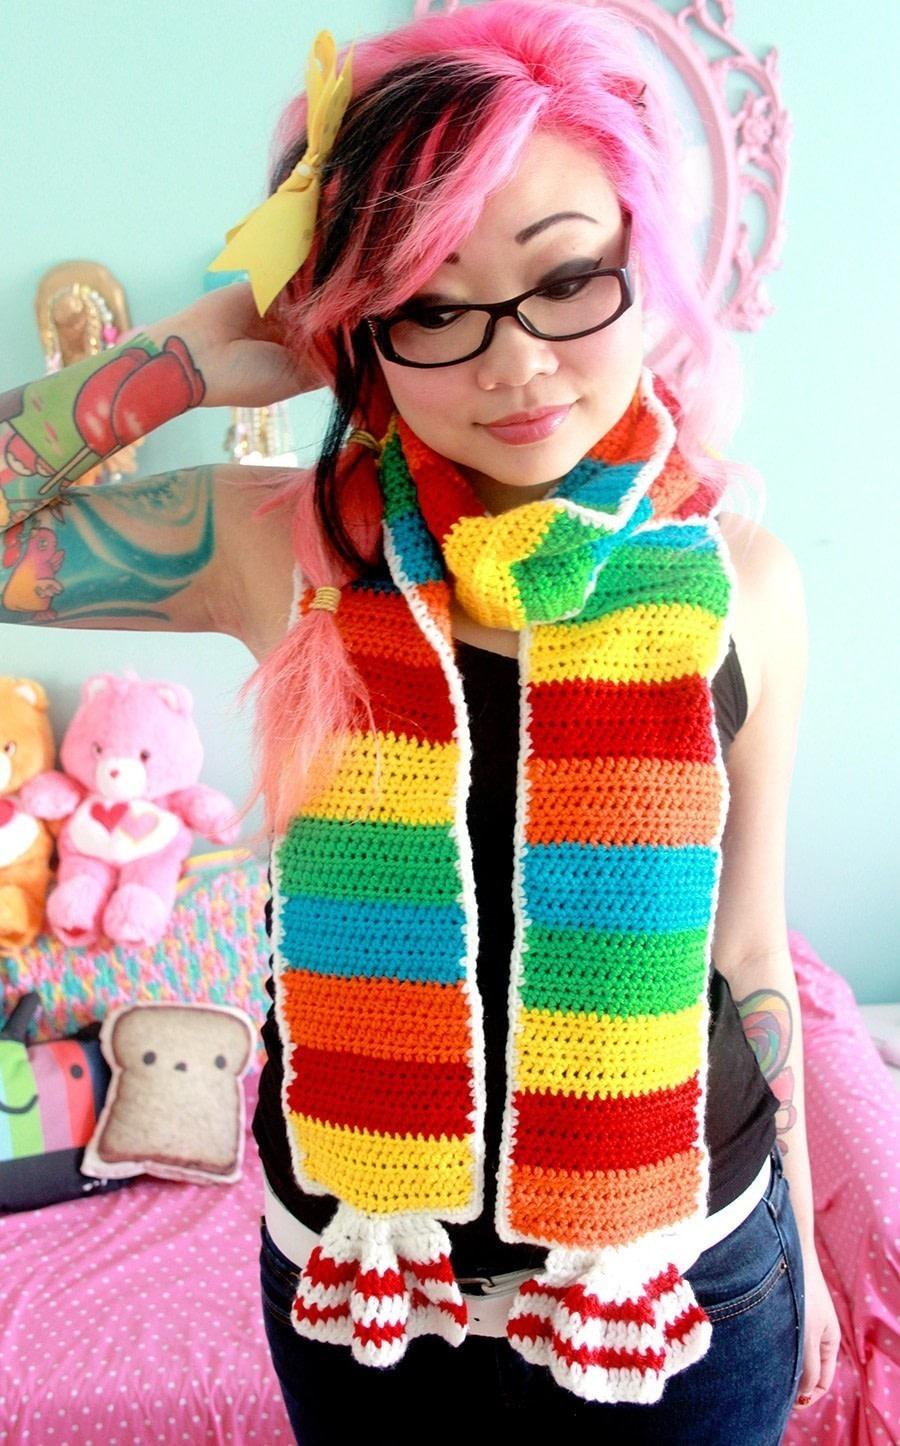 Rainbow Tart Candy Scarf 183 How To Knit Or Crochet A Stripy